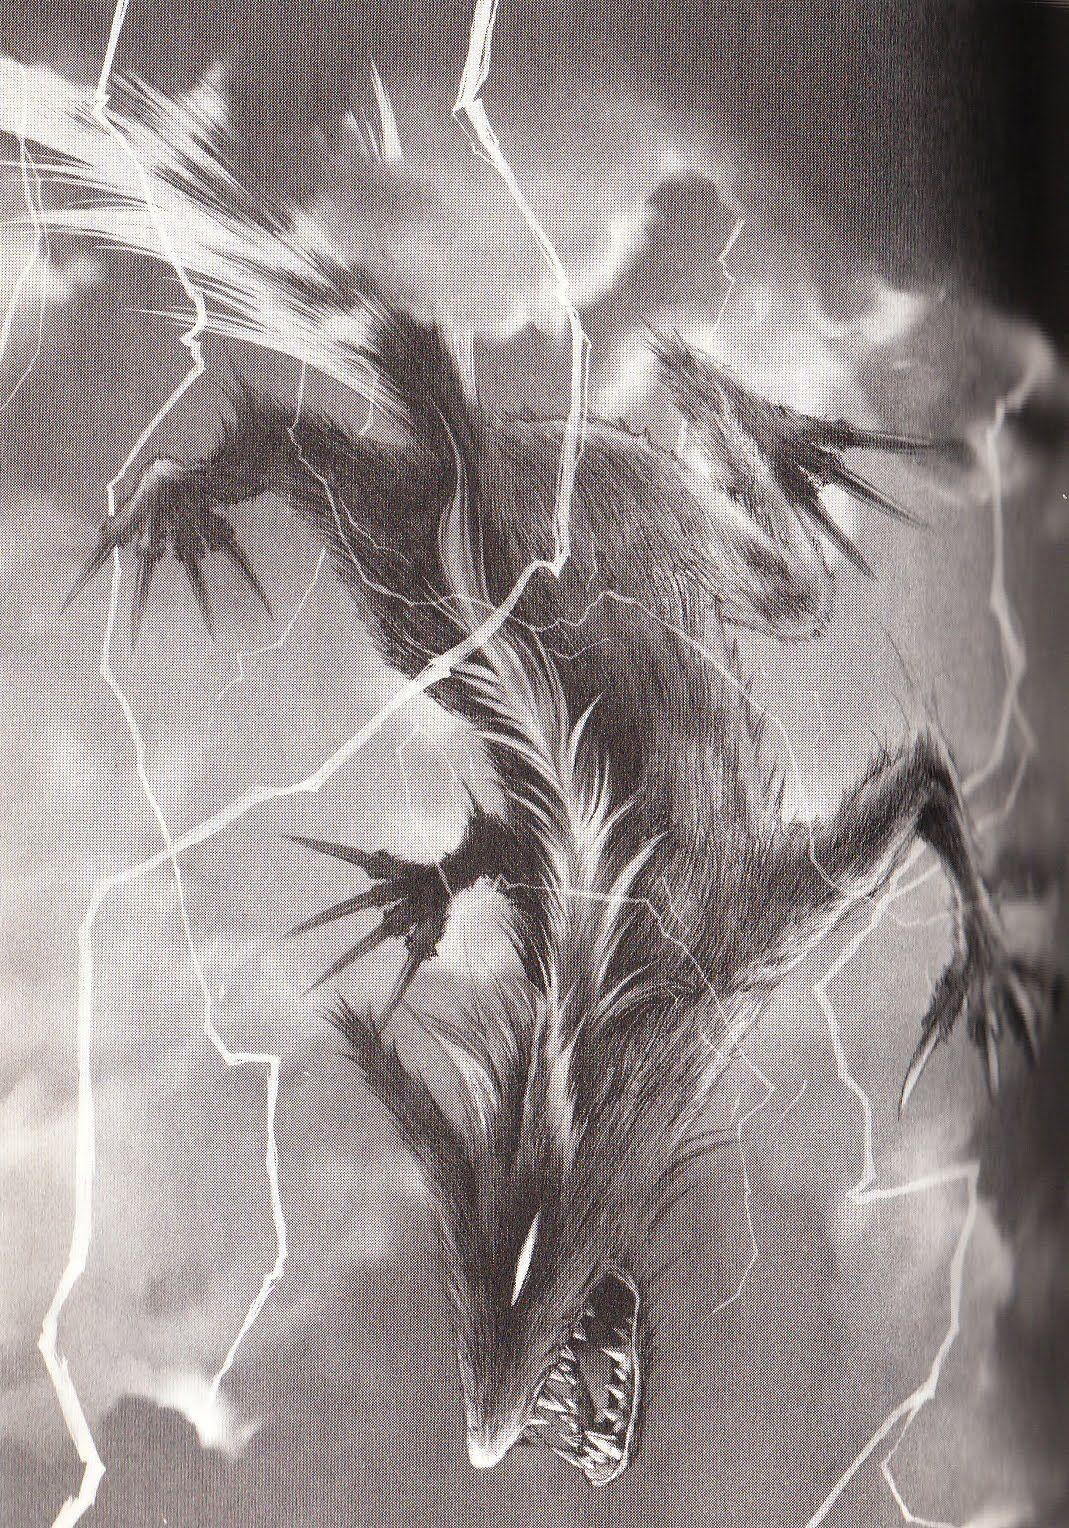 The Raiju Is Friends With Raijin The Shinto God Of Lightning He Falls To Earth In A Blot Of Lightning Mysterious Universe Mythical Monsters Myths Monsters Le raijū (雷獣, ou ) est un yōkai de la mythologie japonaise. the raiju is friends with raijin the